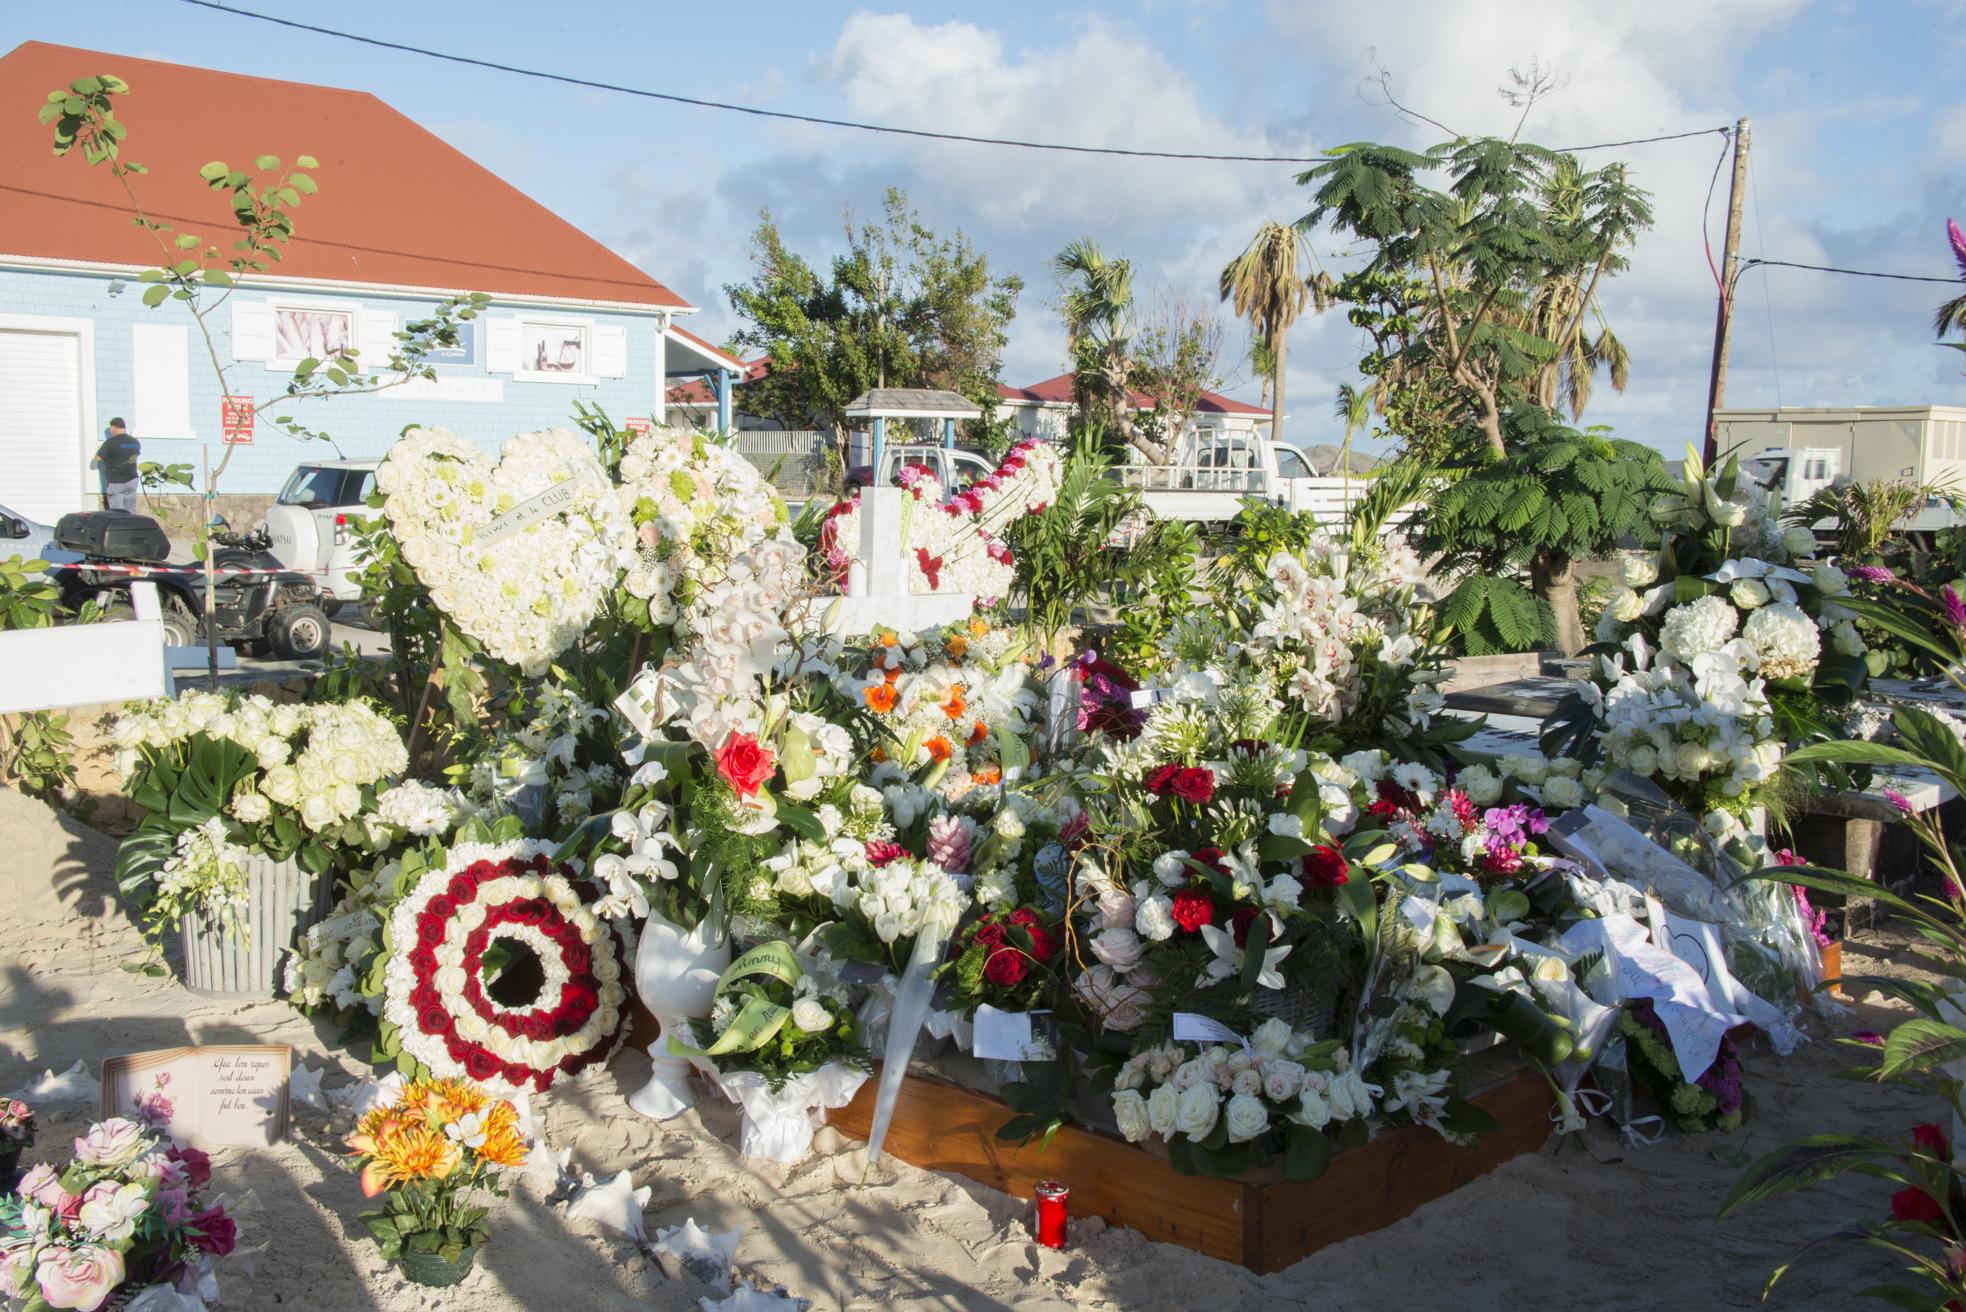 Un message polémique a été retiré de sa tombe — Johnny Hallyday